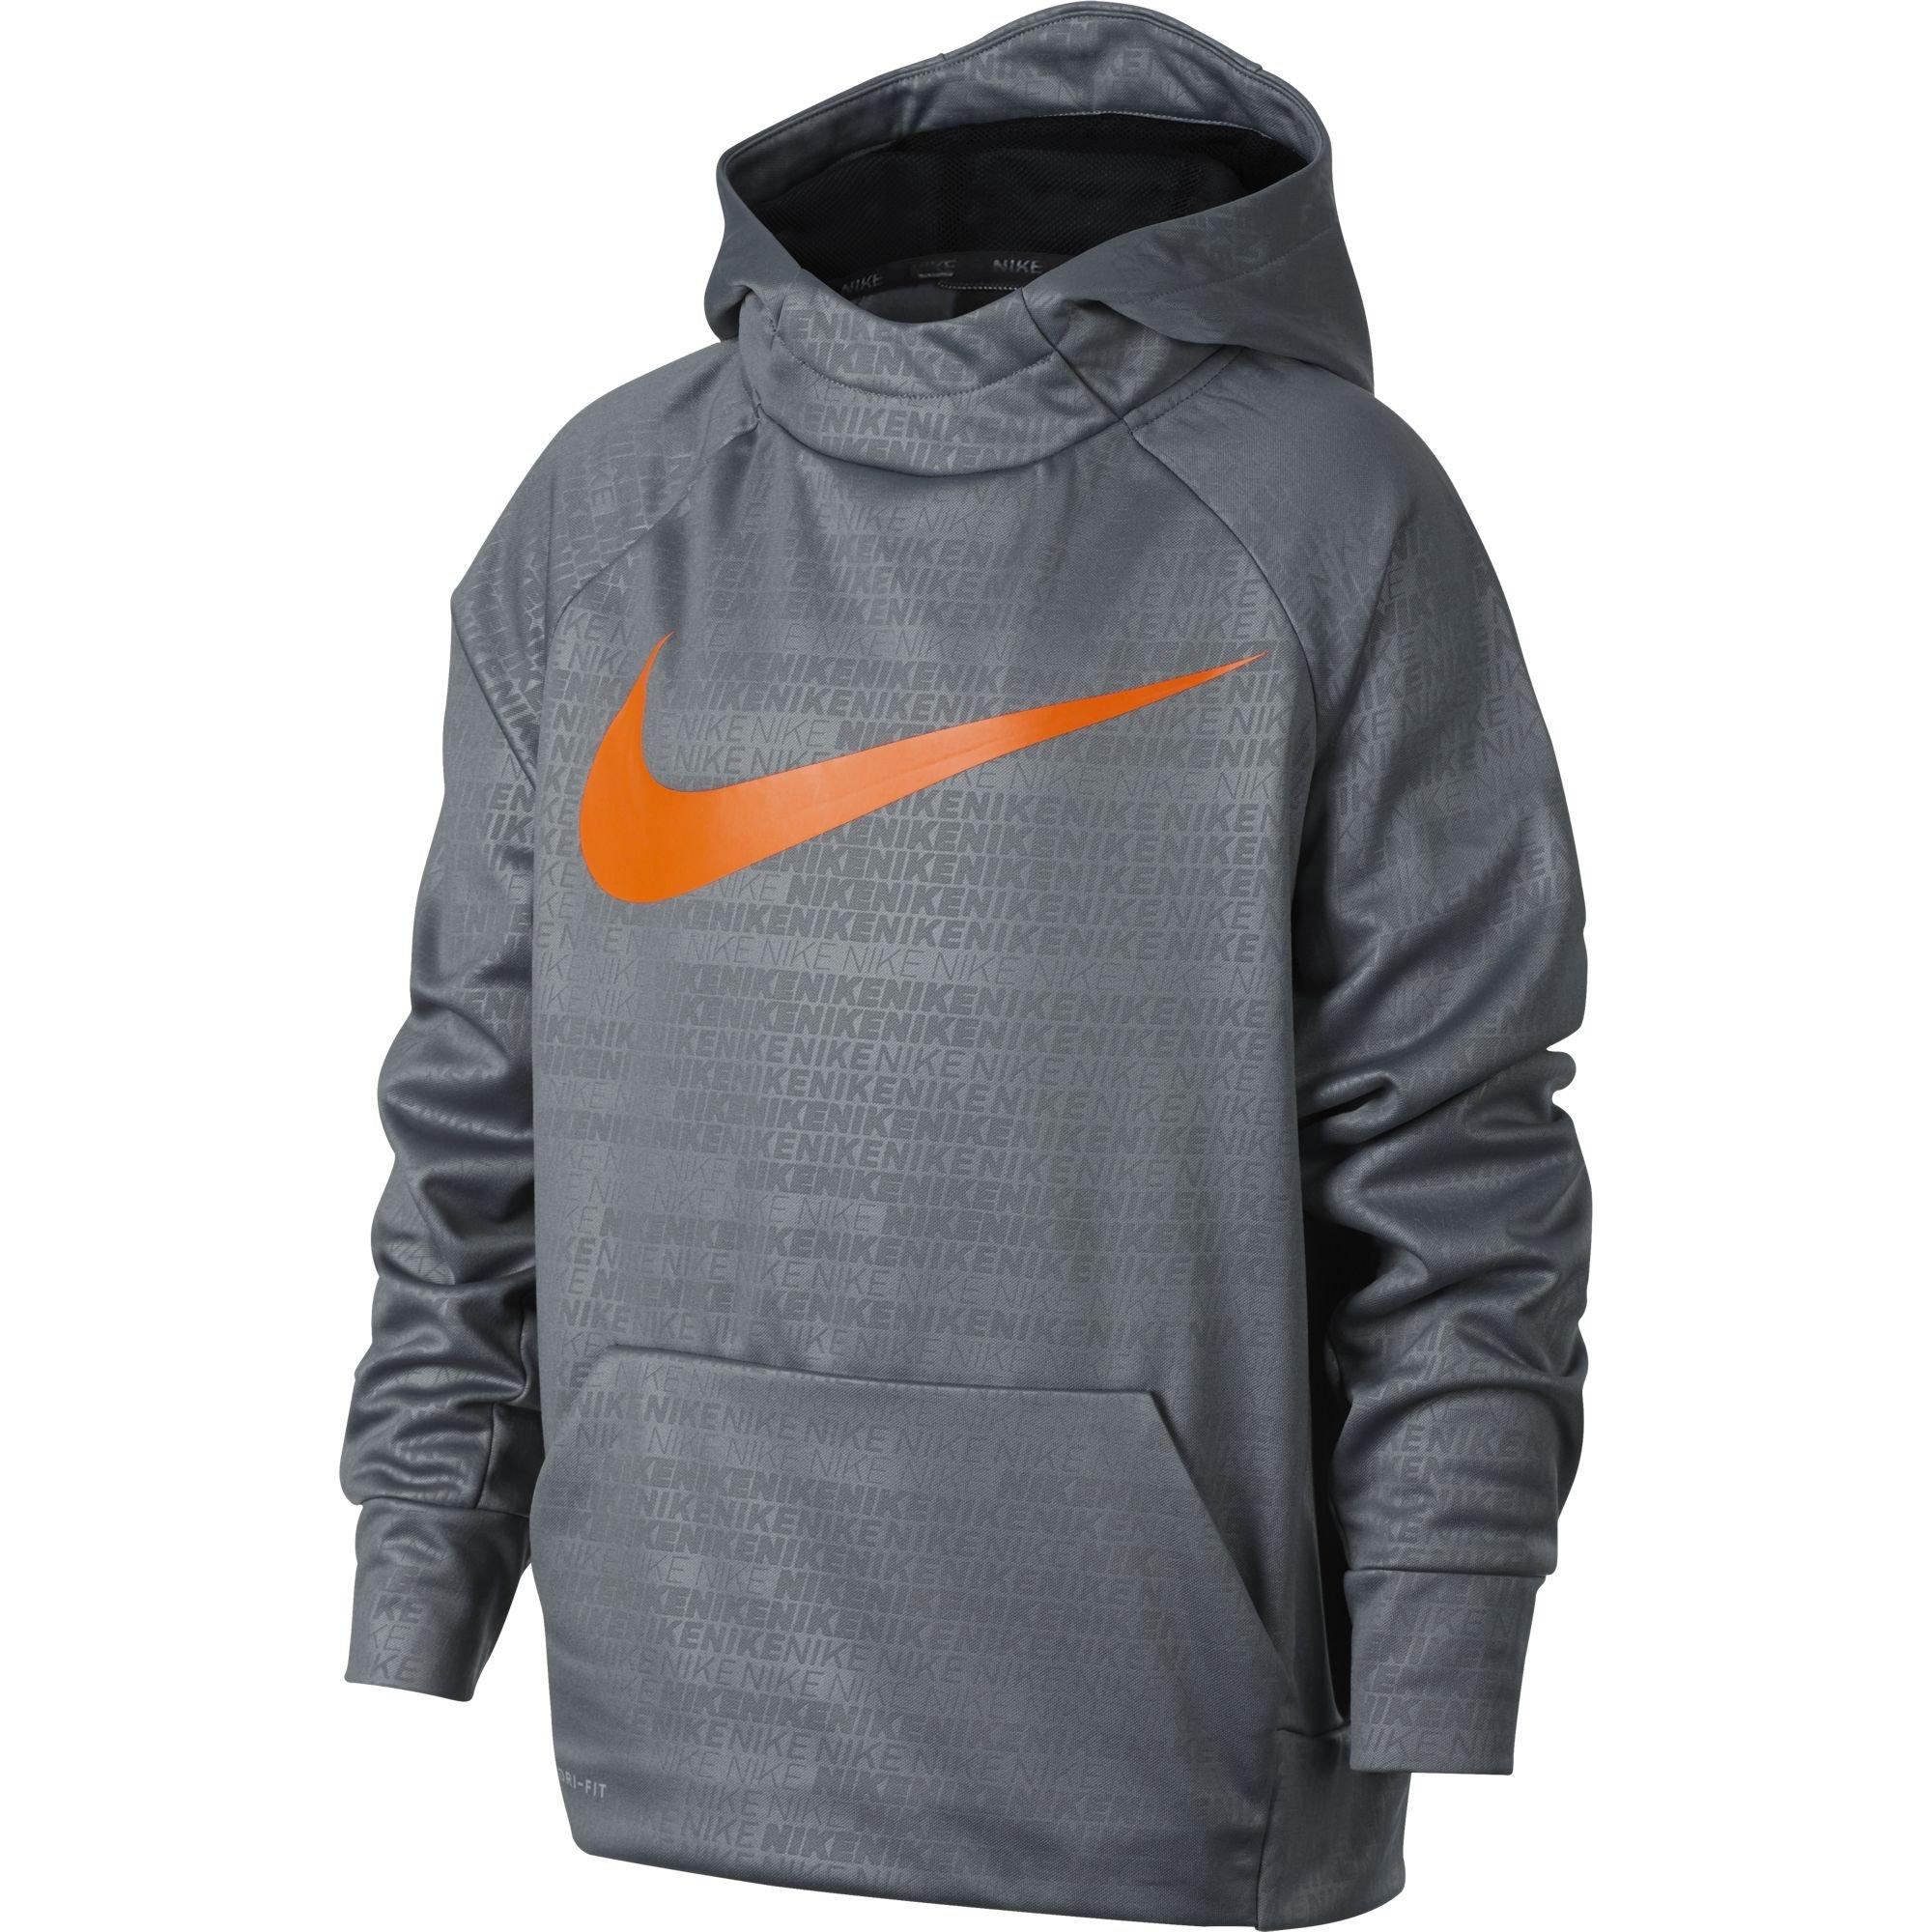 Nike Boy's Therma Training Hoodie Cool Grey Size Medium